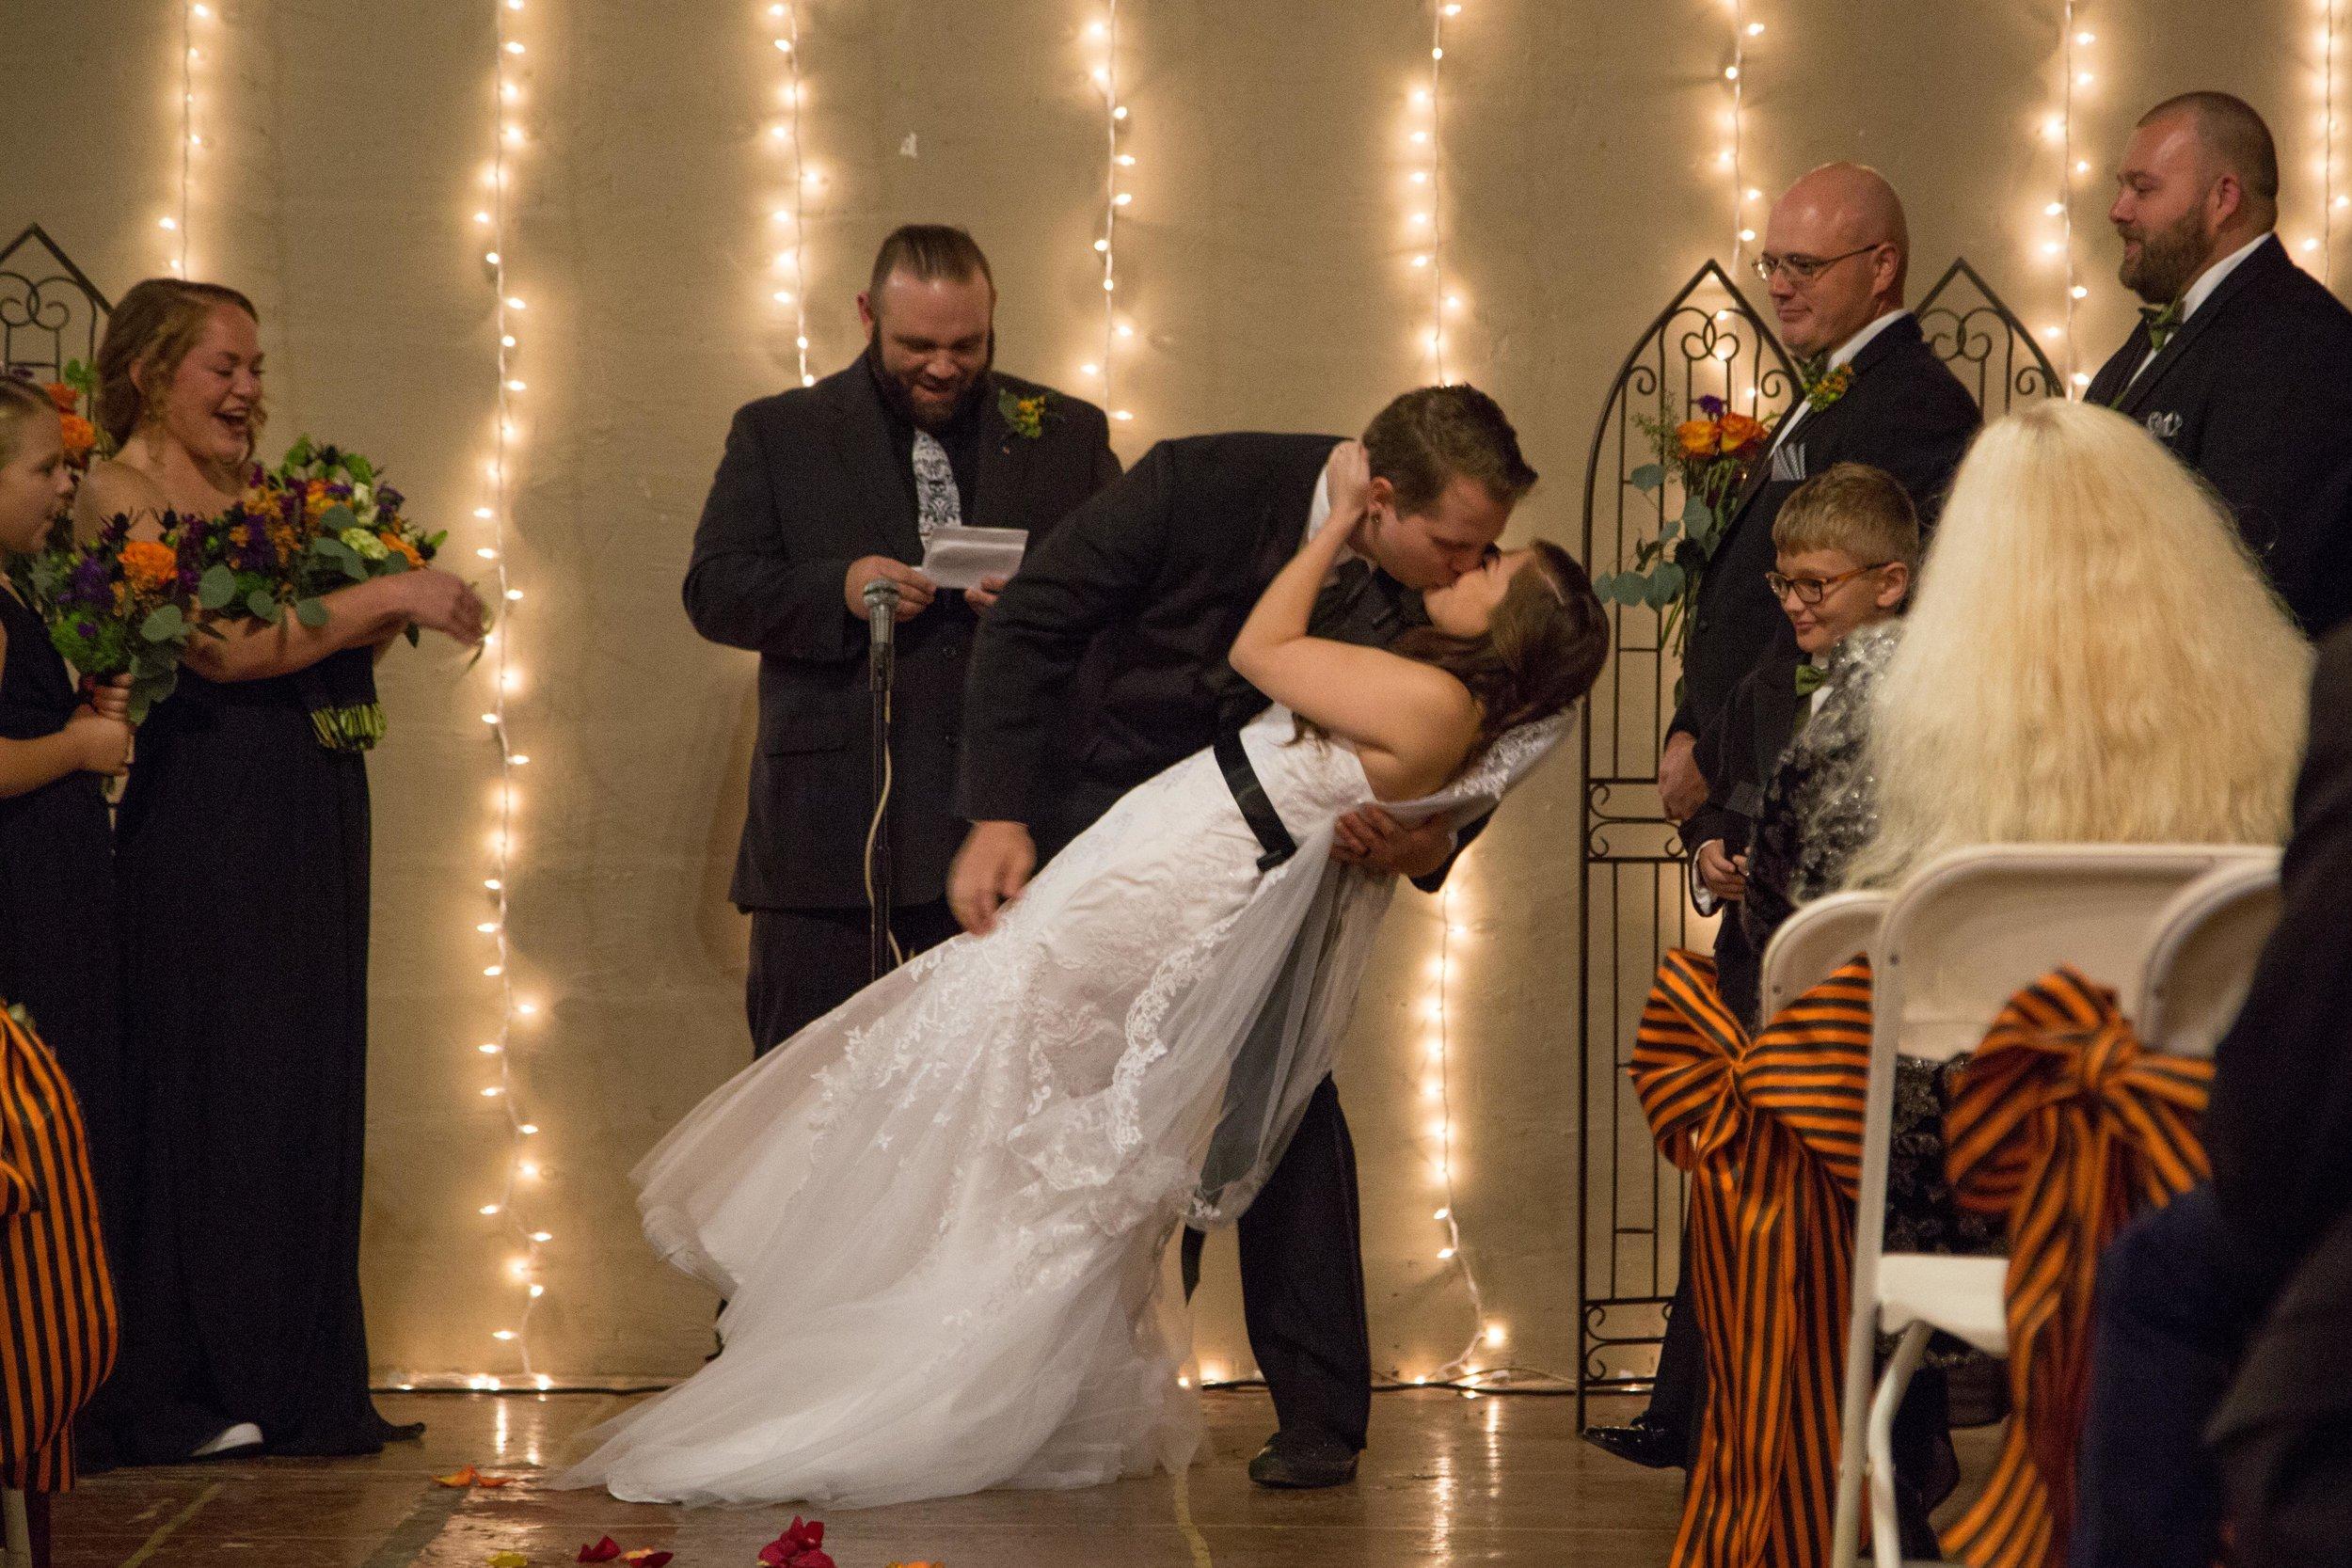 00001_Parker-Wedding-Sp-58.jpg